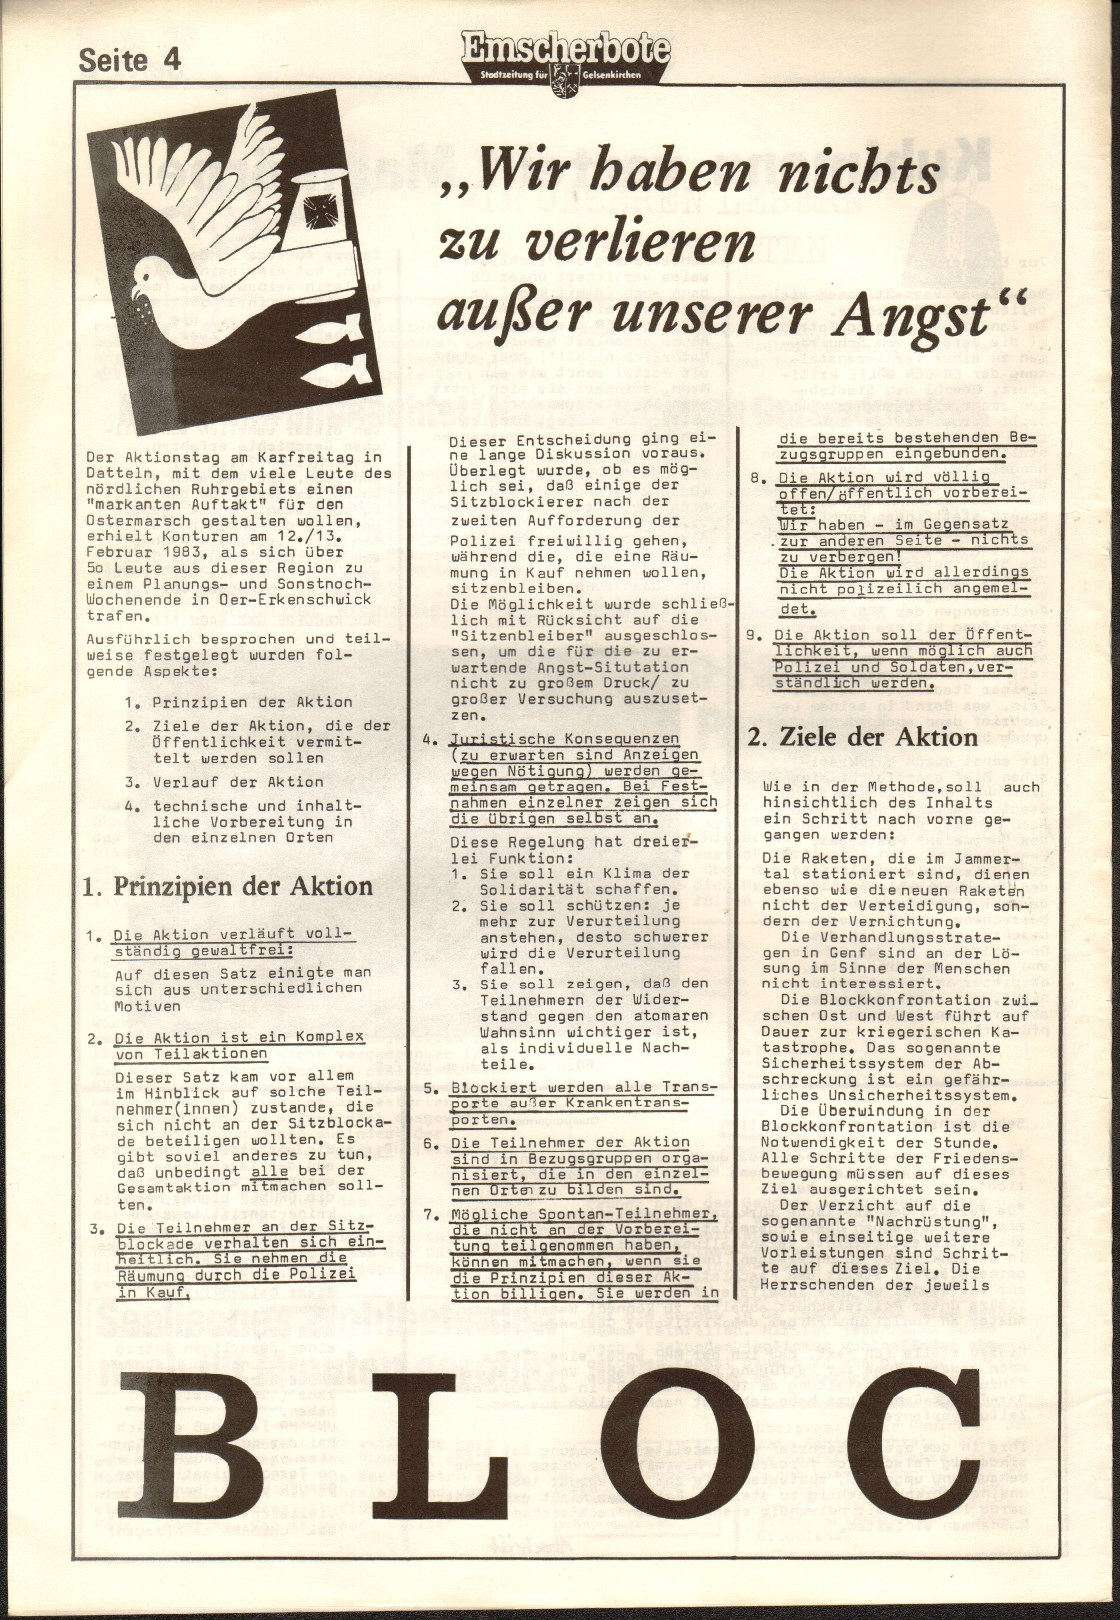 Gelsenkirchen_Emscherbote_1983_26_04